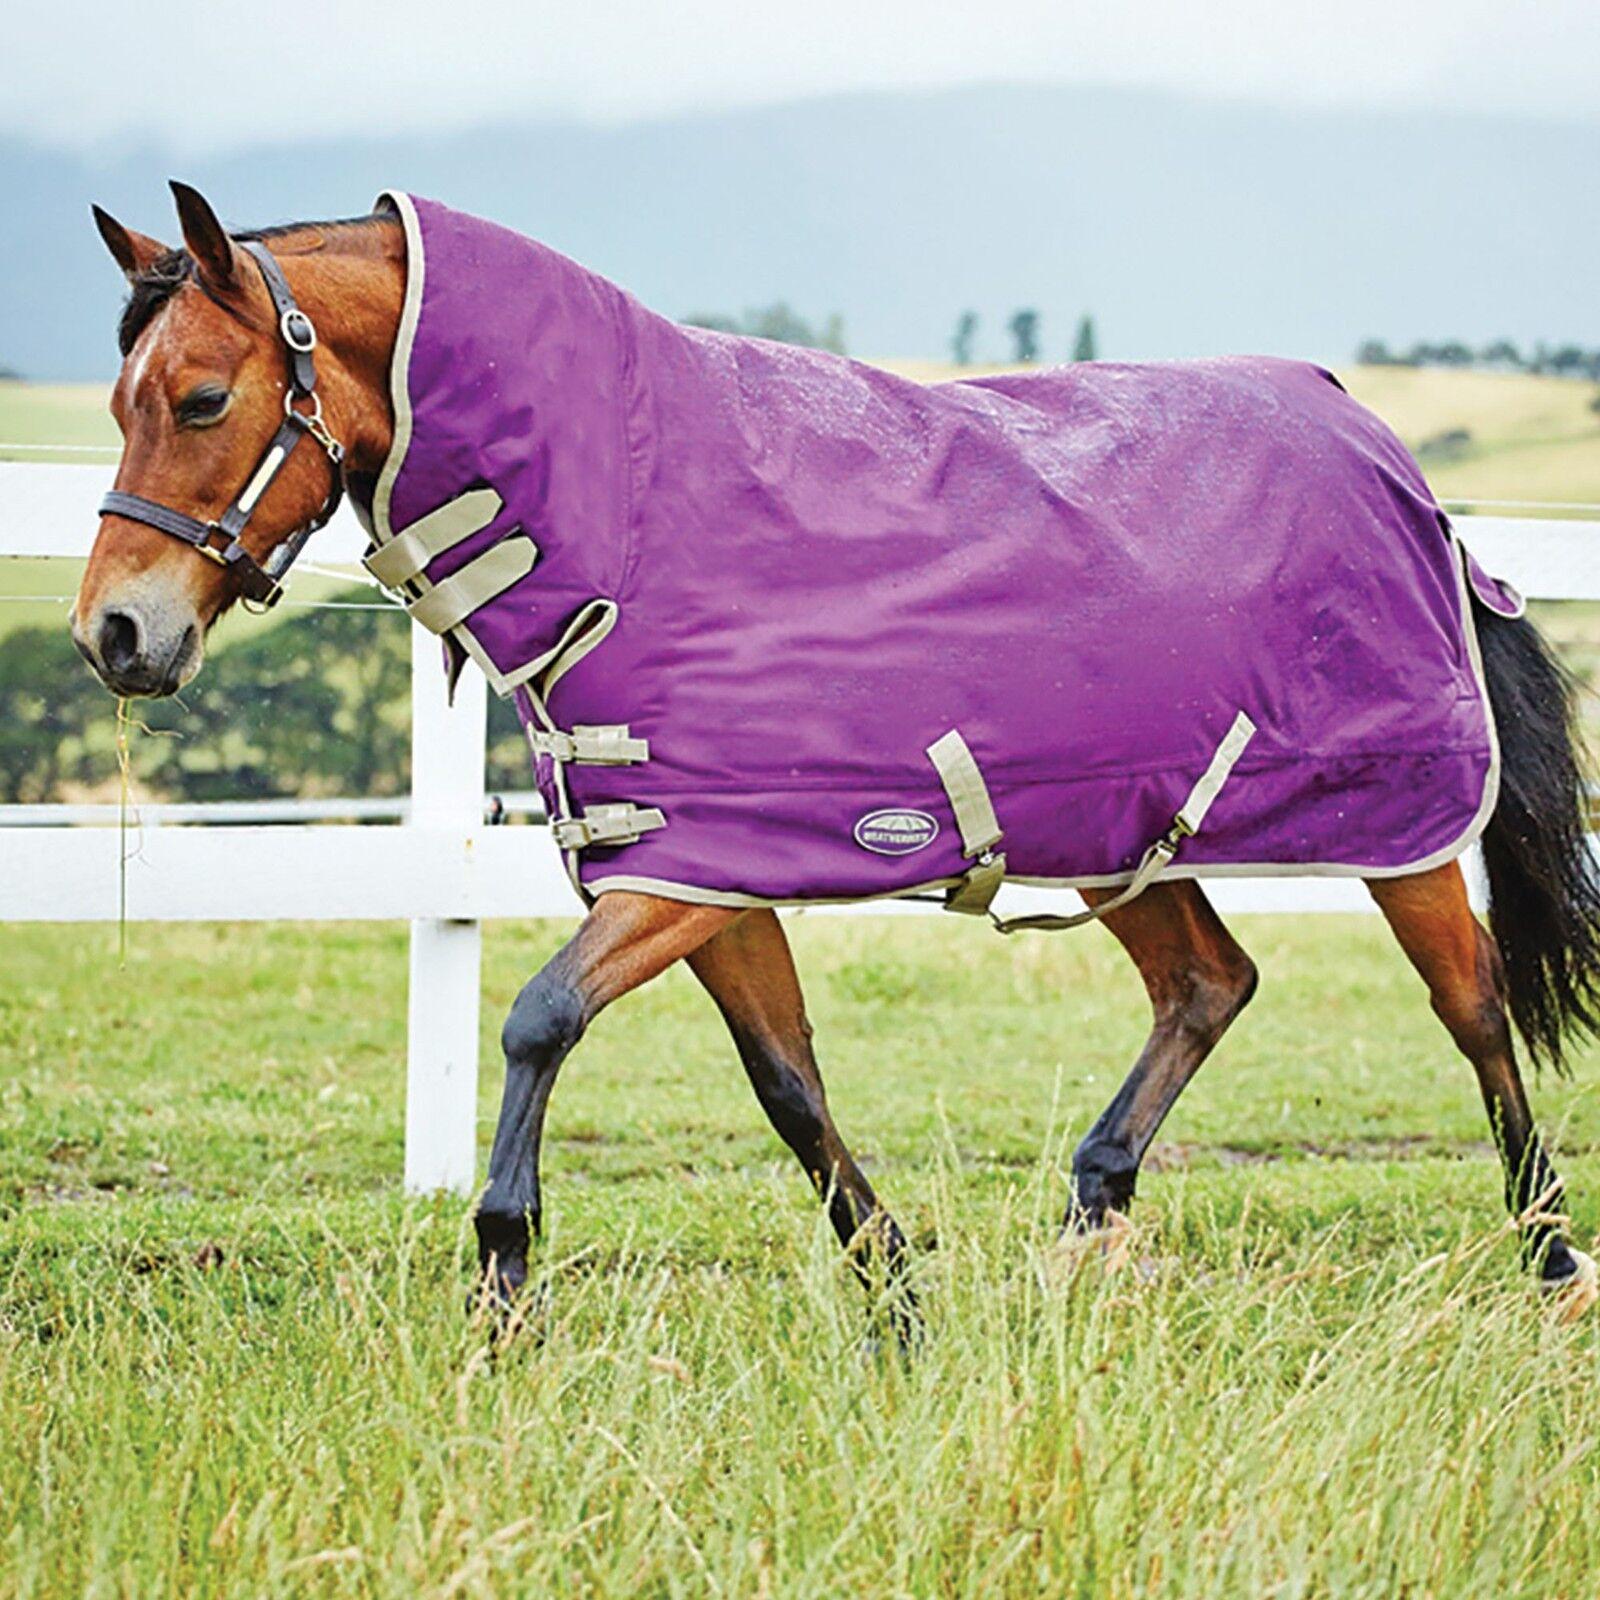 New 1200D Horse Cob Pony Weatherbeeta Genero 1200D New Heavy Weight ComboTurnout fa7c42